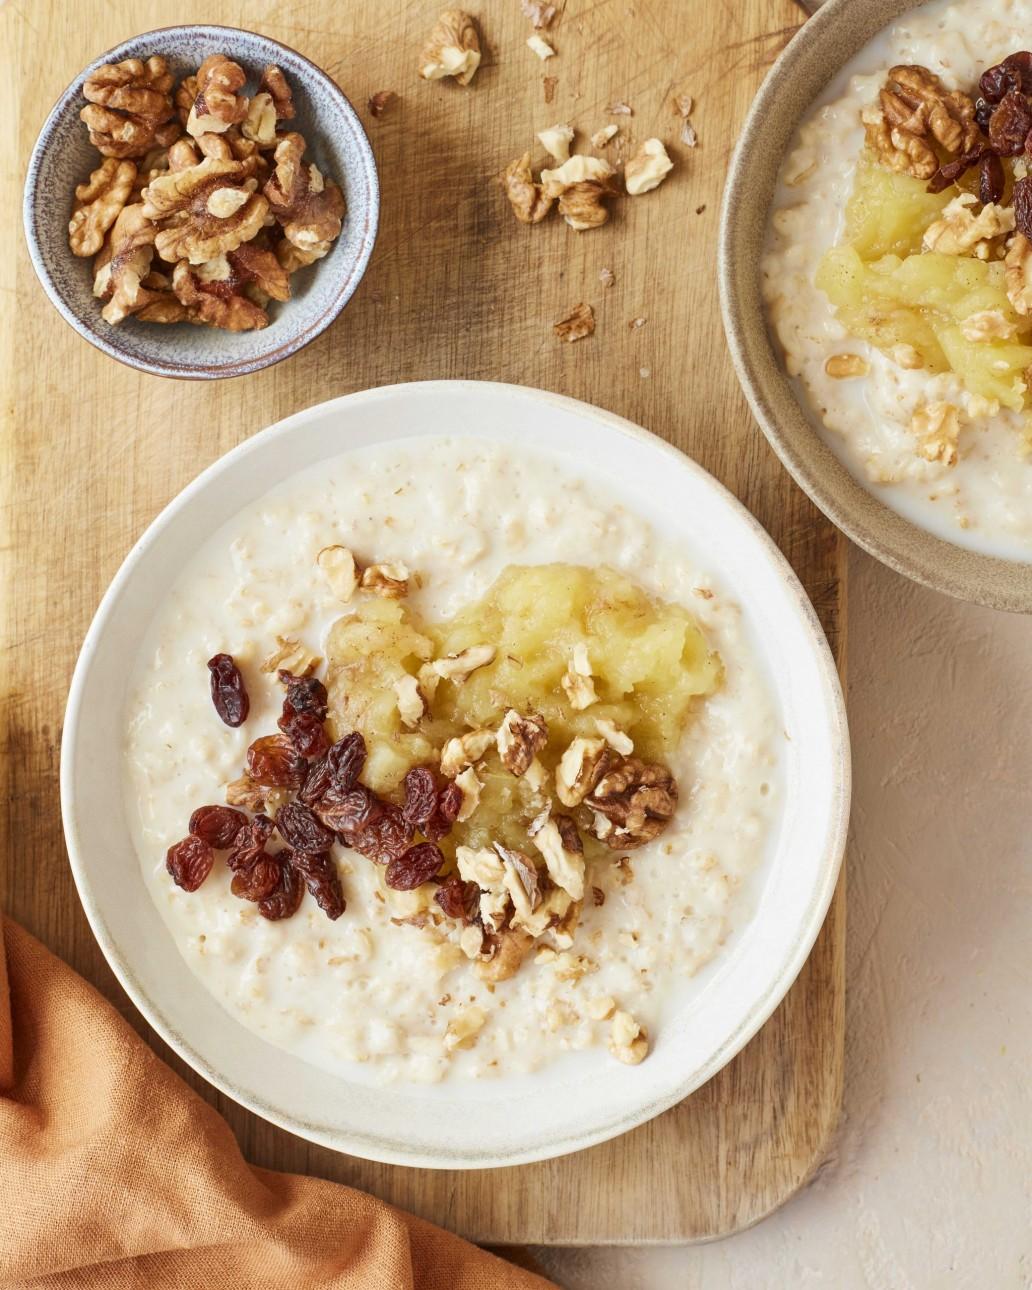 Amelia Freer's 10 recipes for nourishing your body this January - Porridge - Humphrey Munson